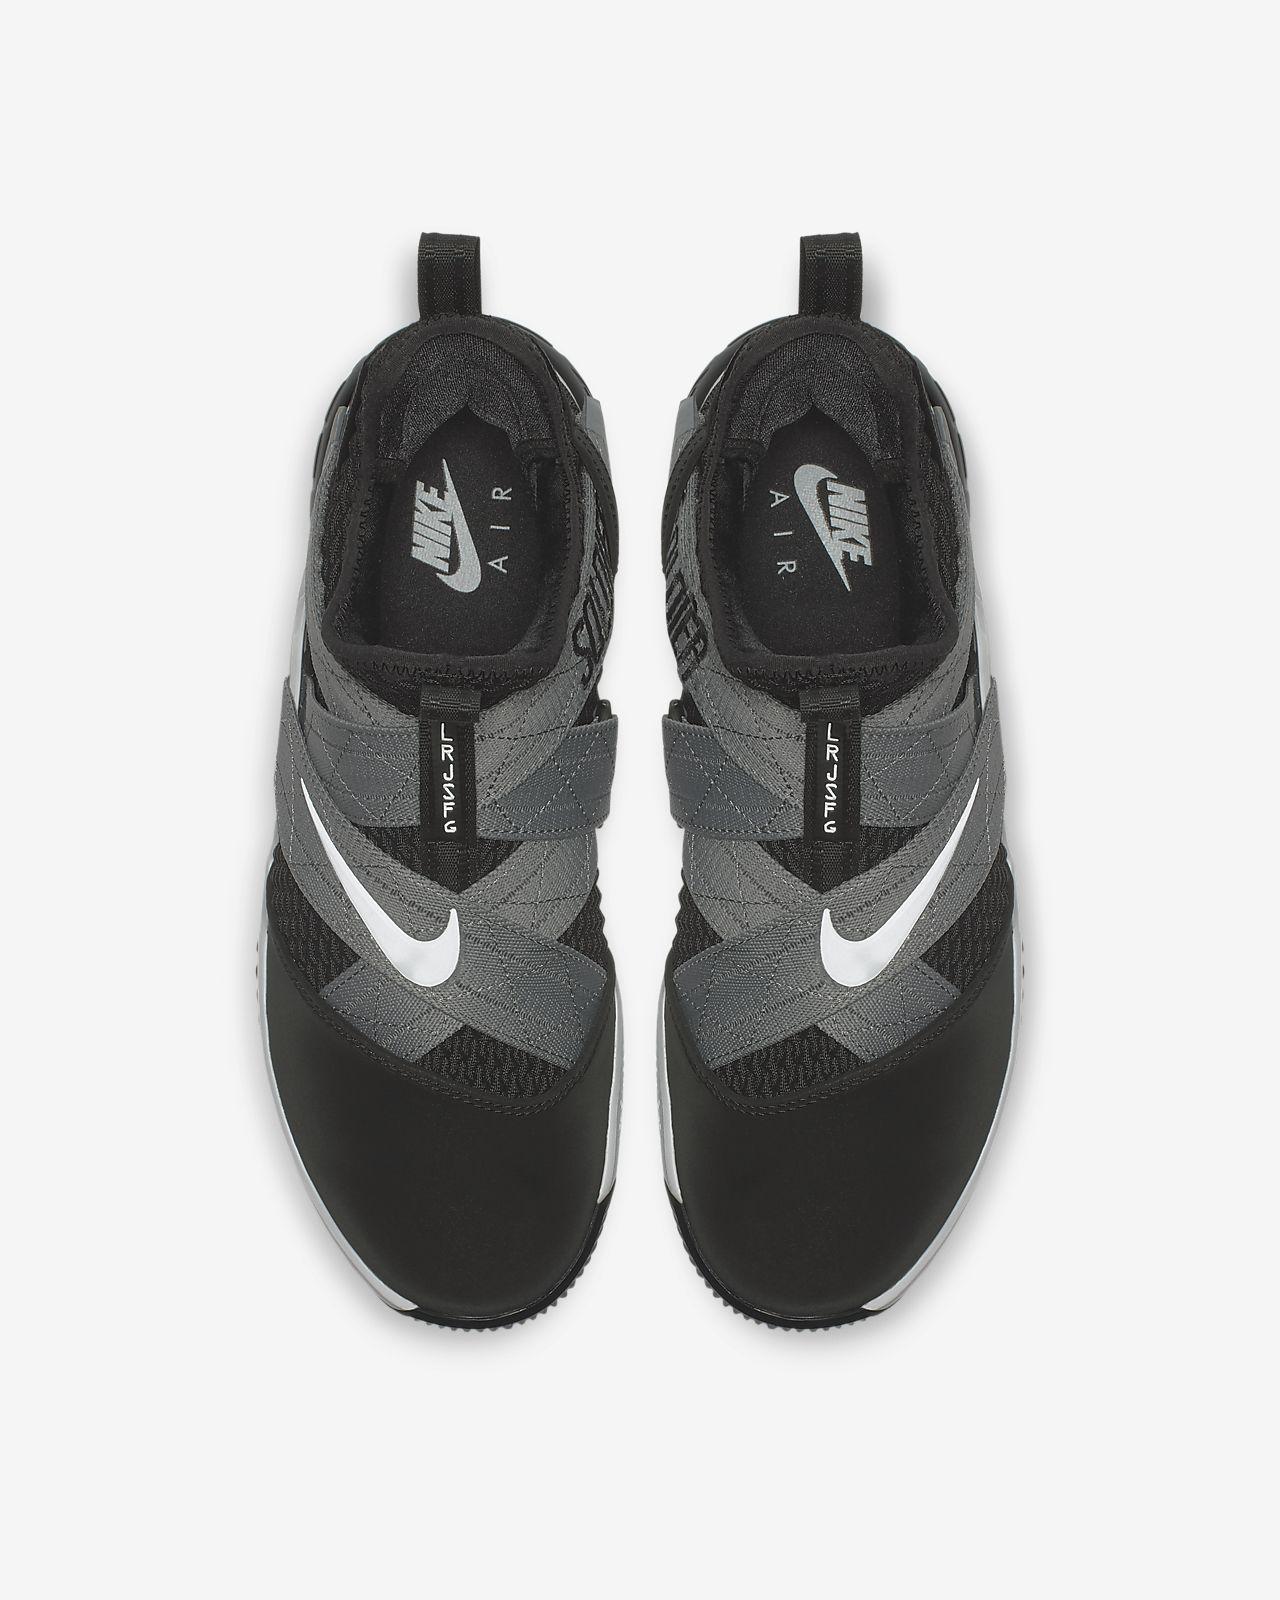 cda691d7a79 LeBron Soldier 12 SFG Basketball Shoe. Nike.com ID